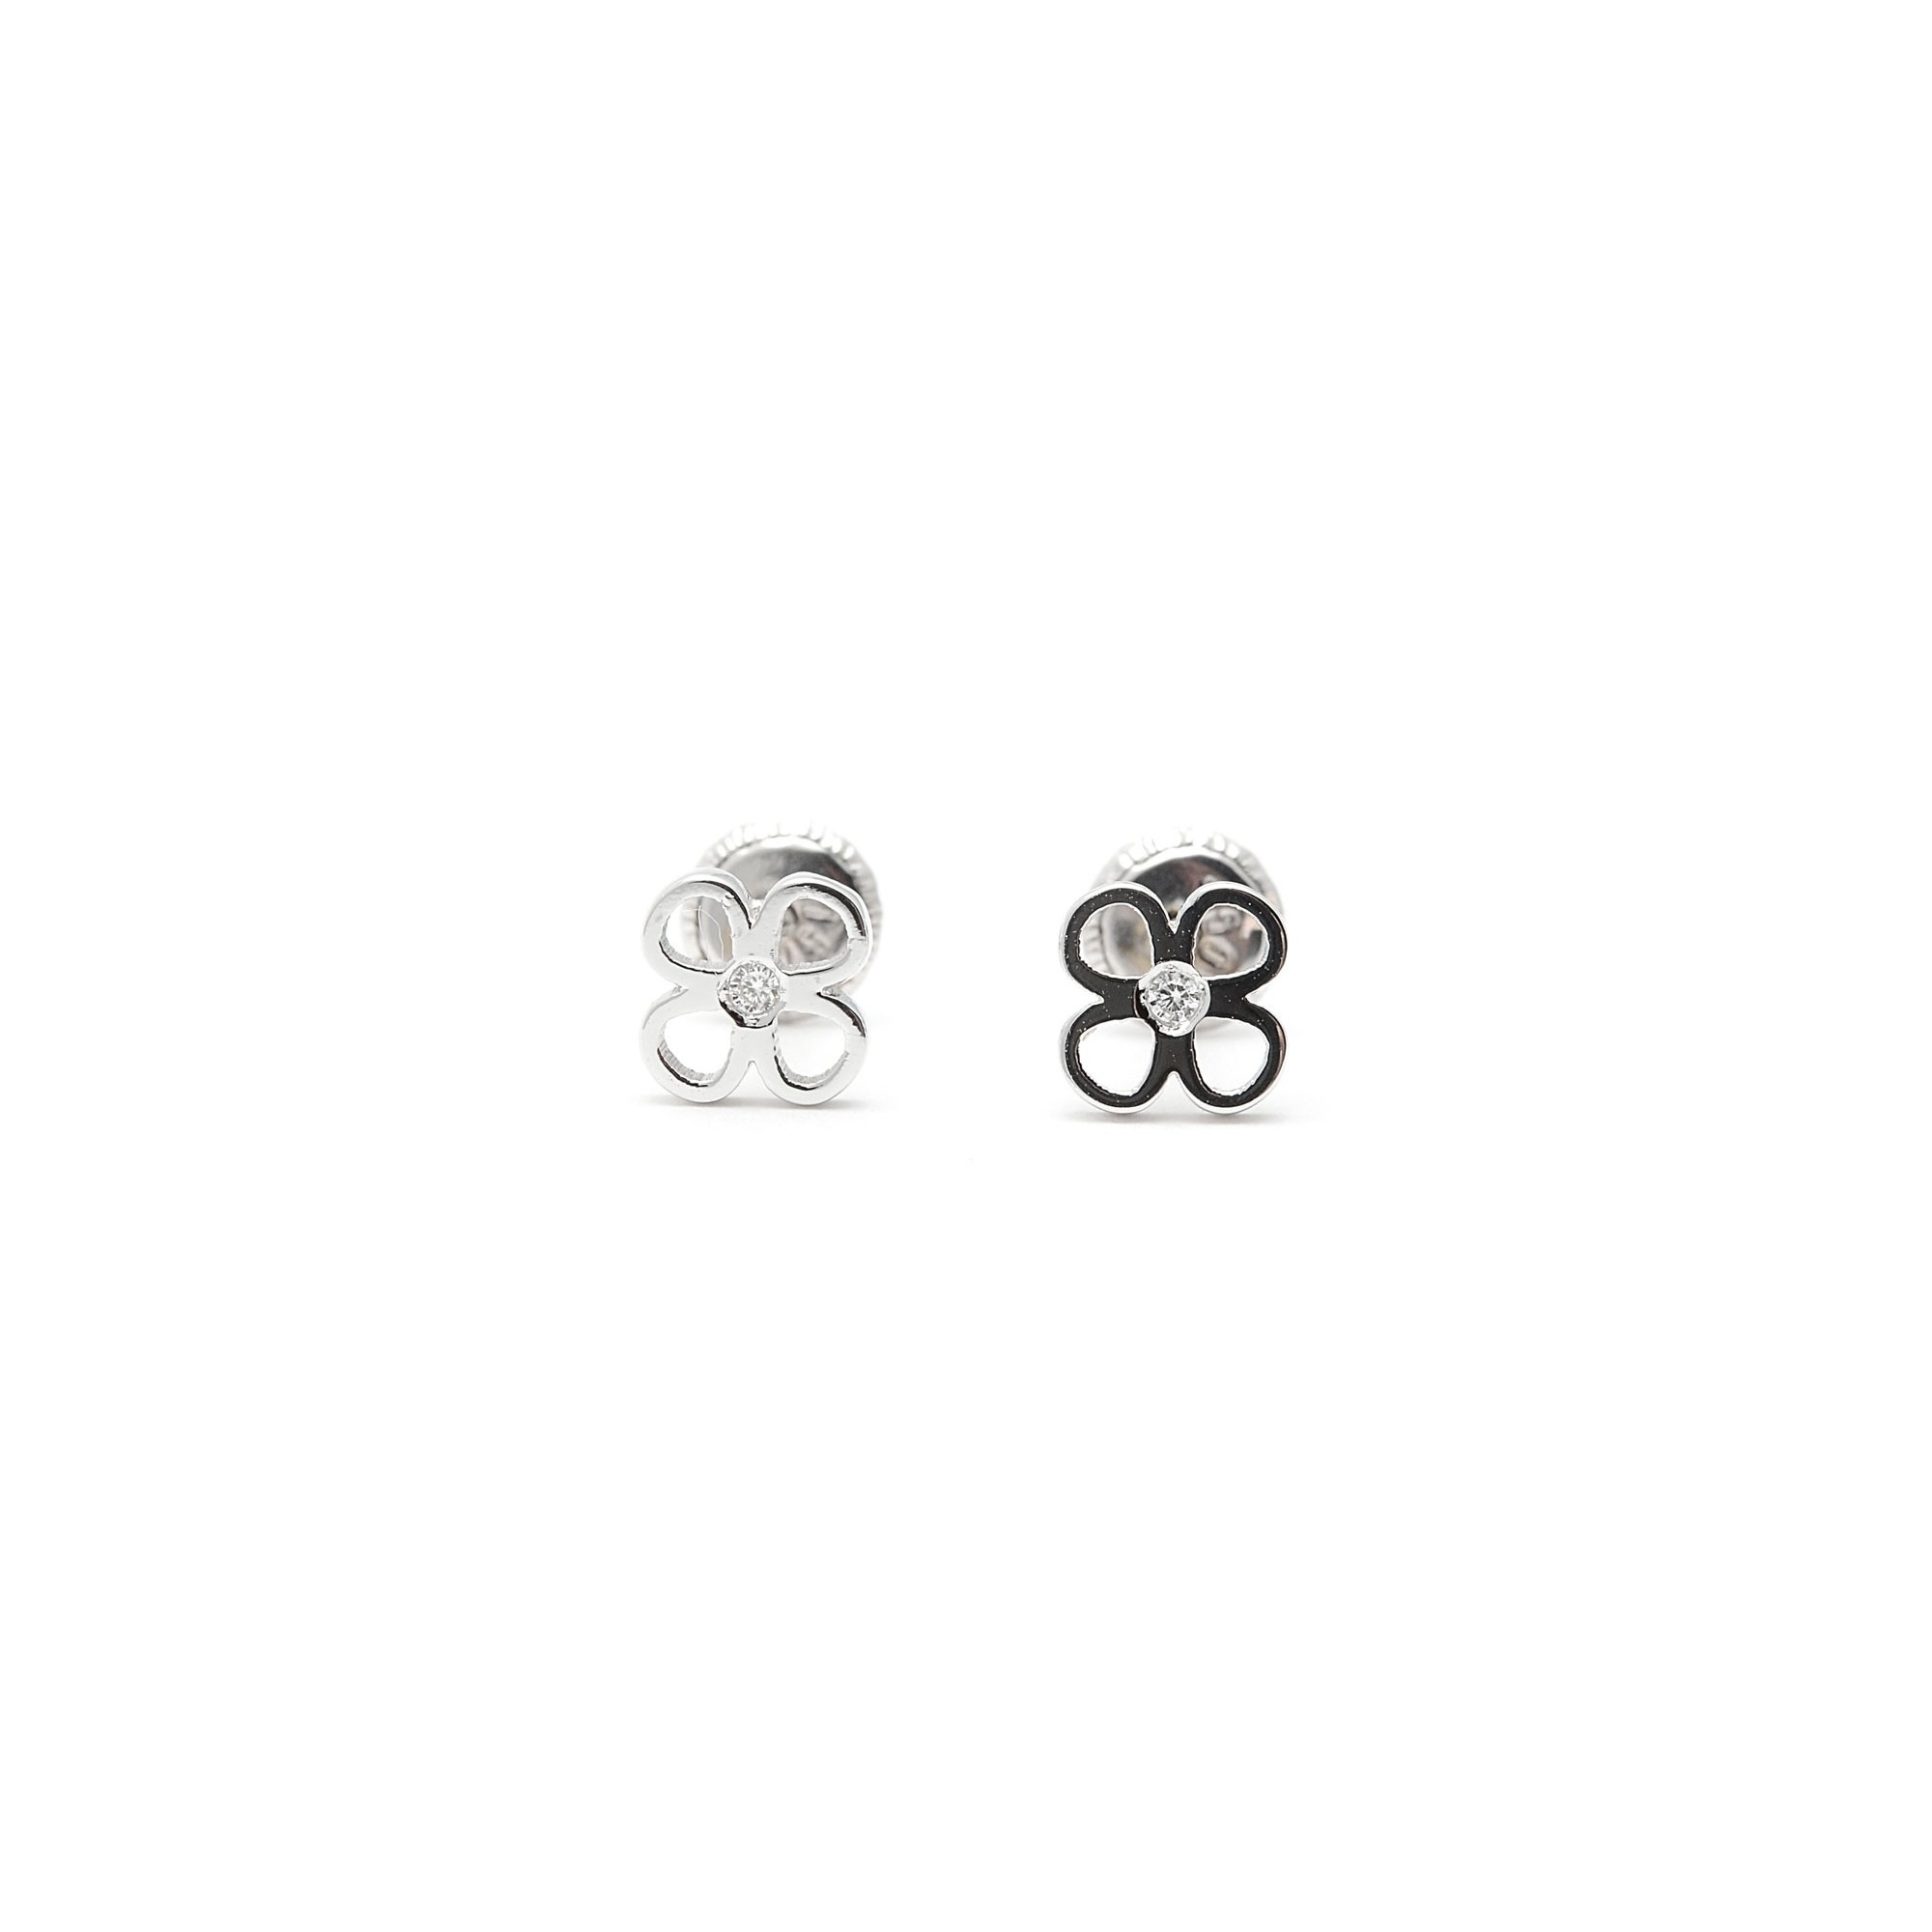 6107ce172bcf Pendientes Oro Blanco Bebé Niña Infantil Rosca Trébol Diamante